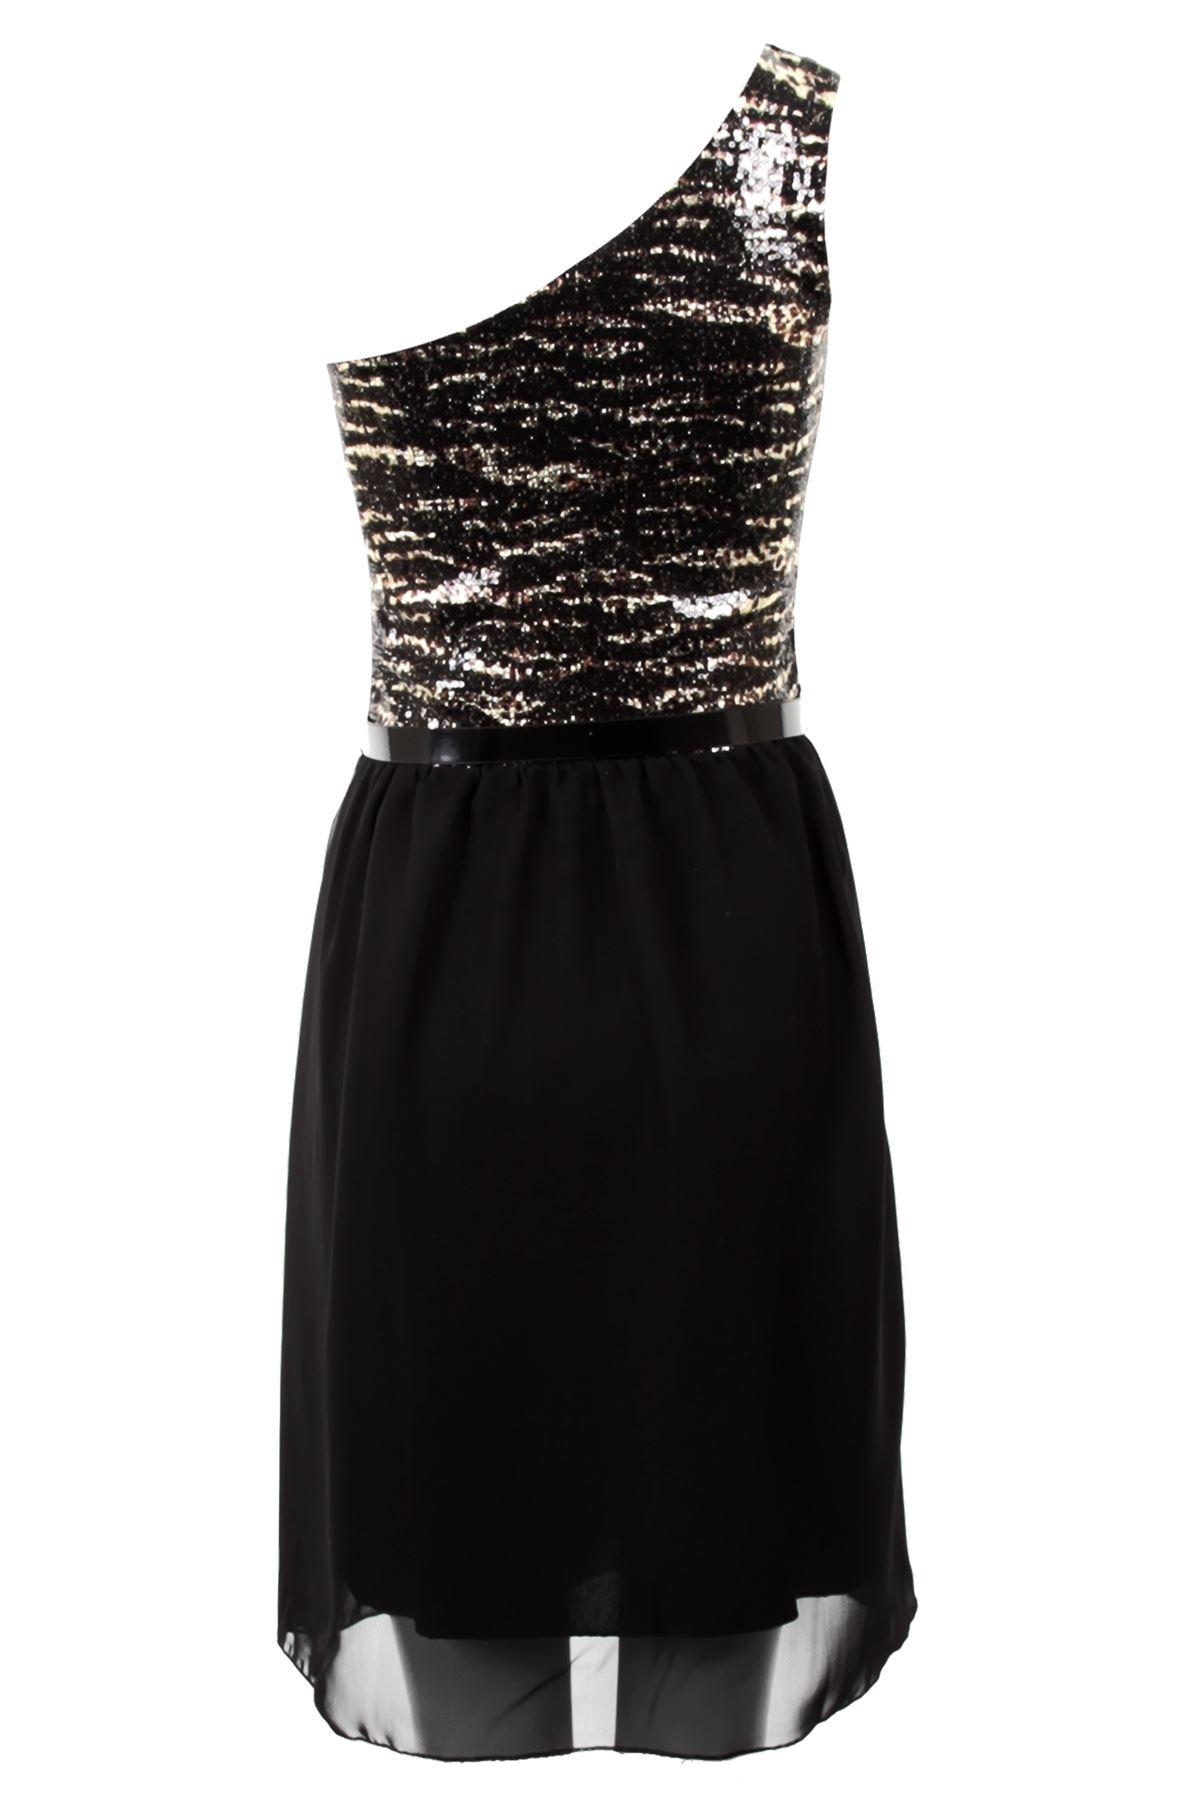 Mujer-asimetrico-noche-lentejuelas-Chiffon-Con-Cinturon-Vestido-De-Fiesta-Talla